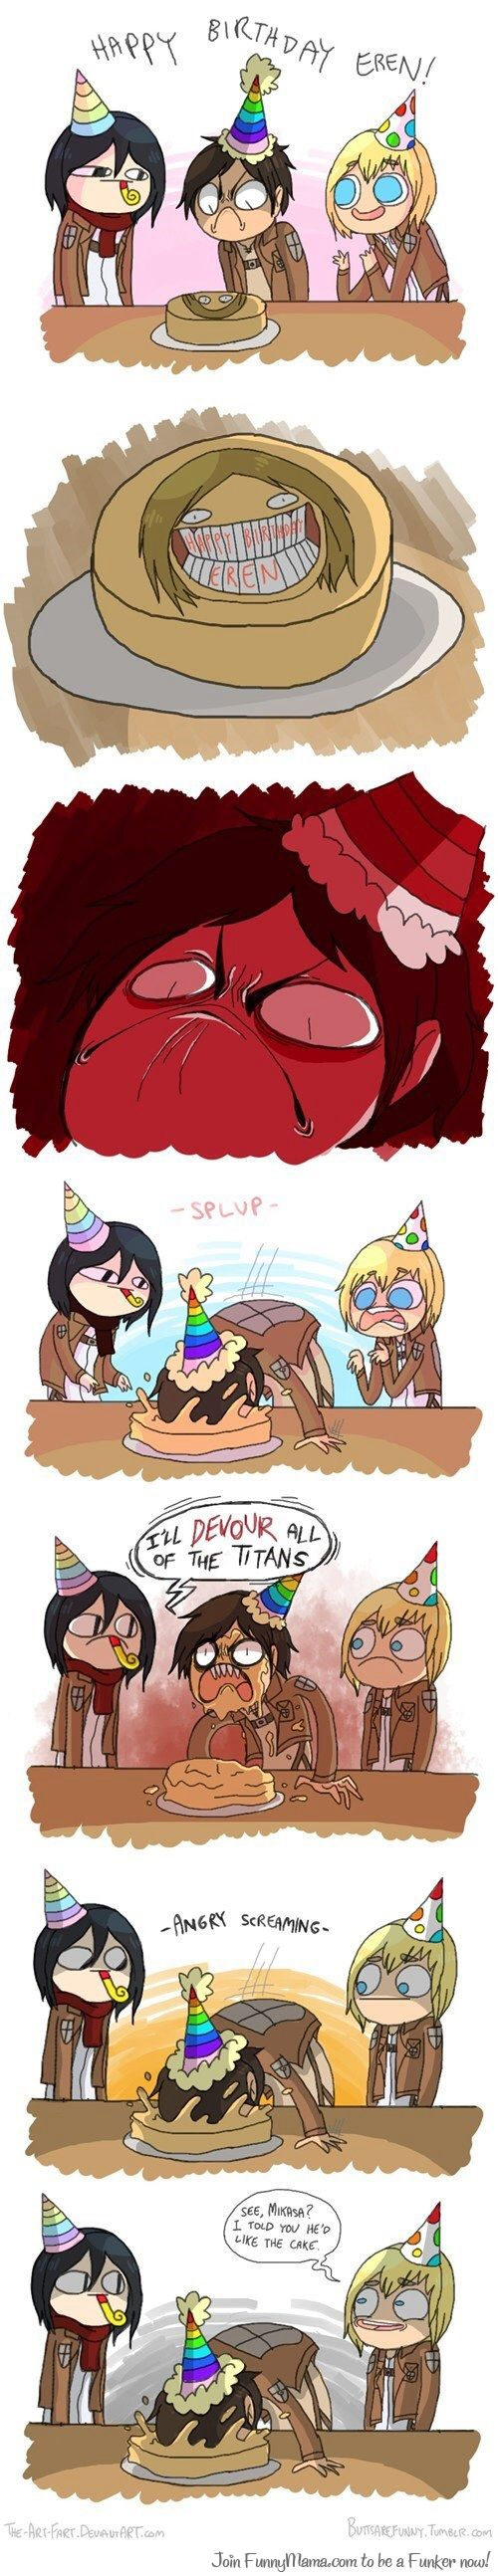 Happy Birthday Eren